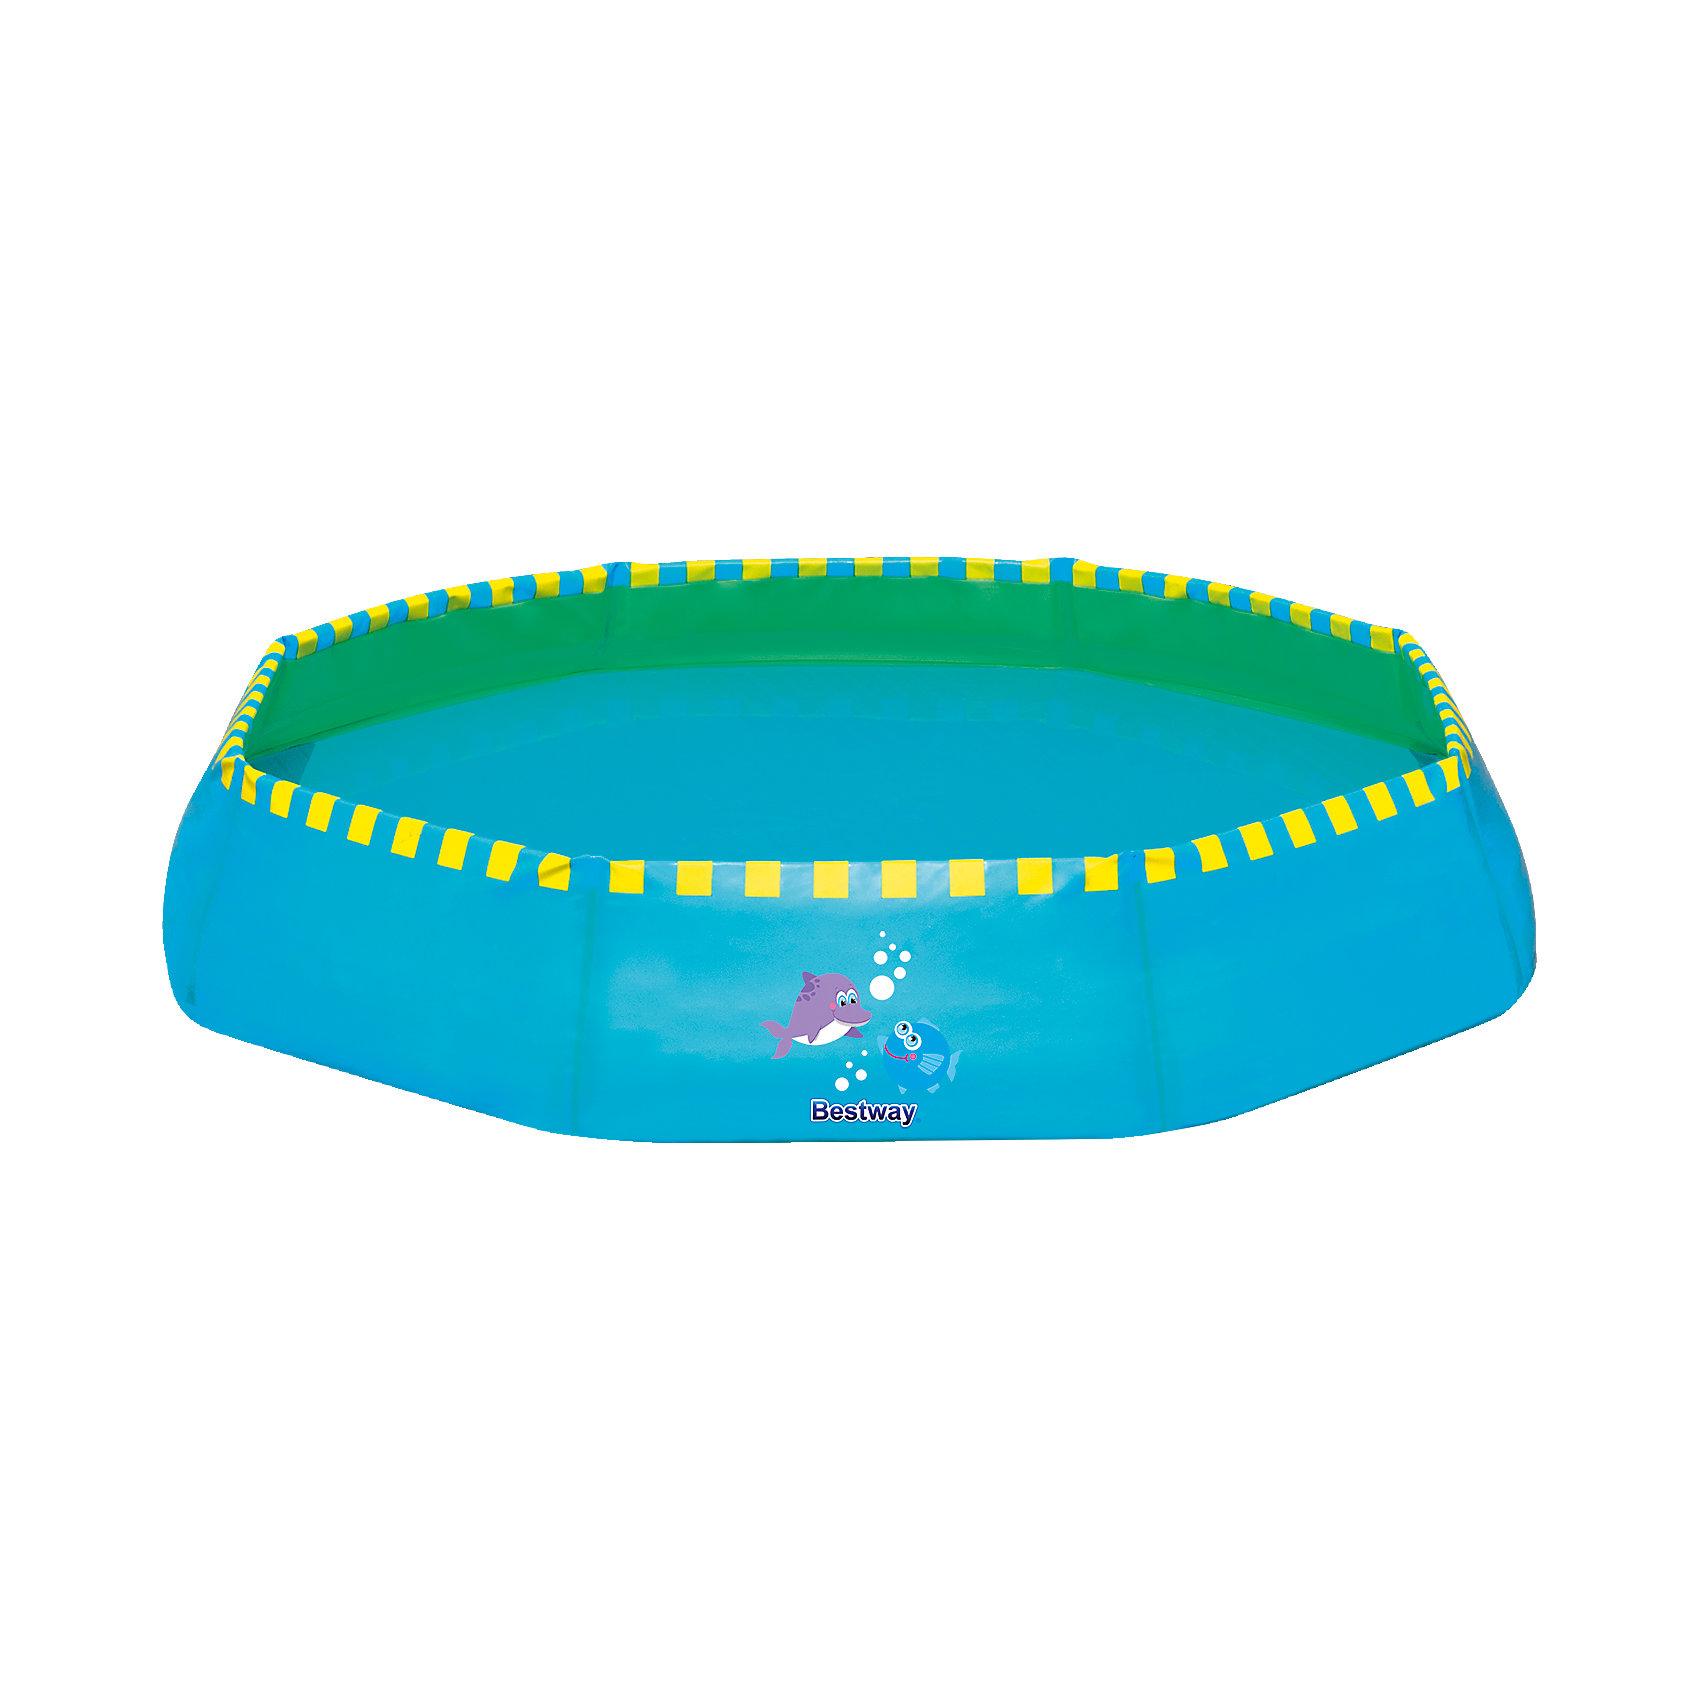 Bestway Ненадувной бассейн, 117 л синий, Bestway бассейн tom jerry bestway 61х15 см bw93043